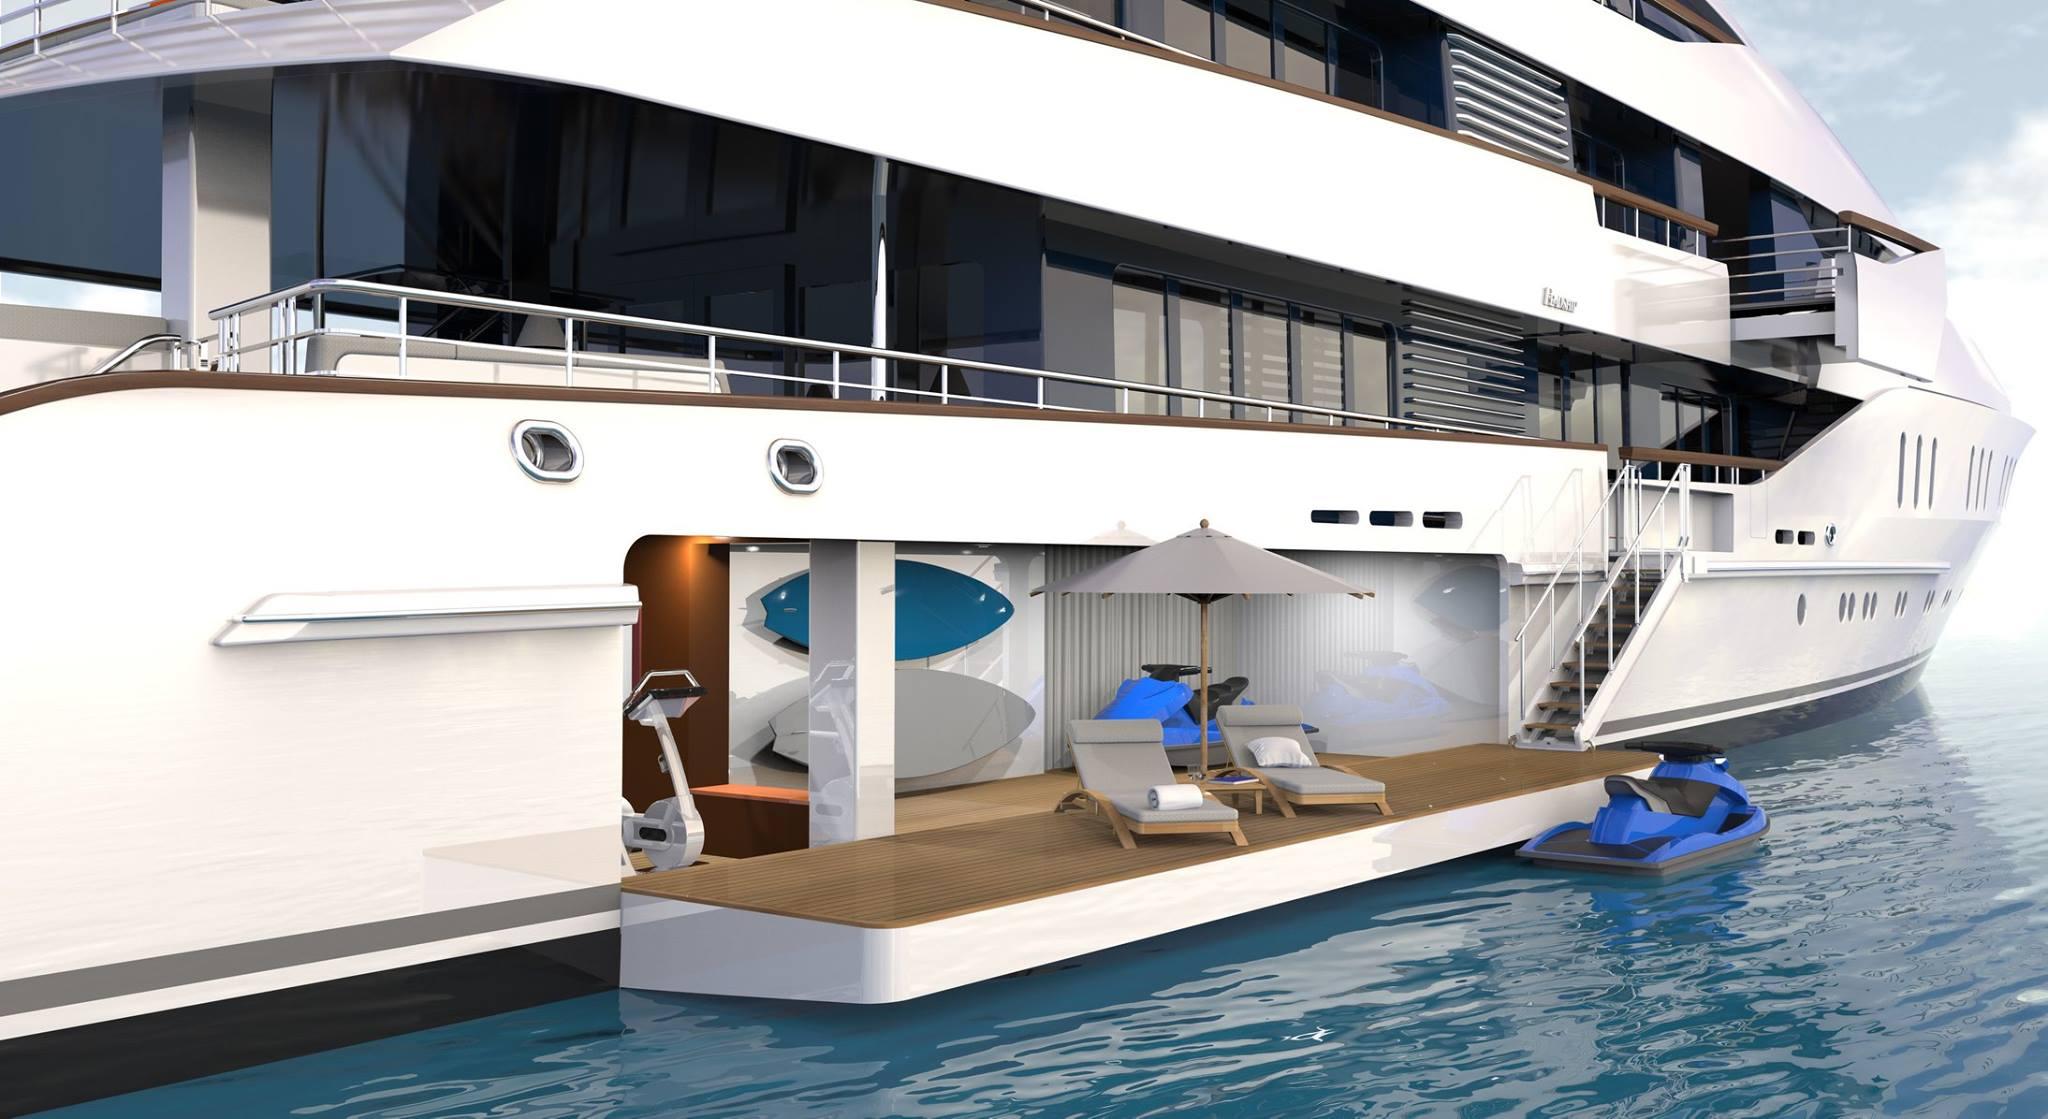 Superyacht Sunday Freshly Launched Vanish Superyacht By